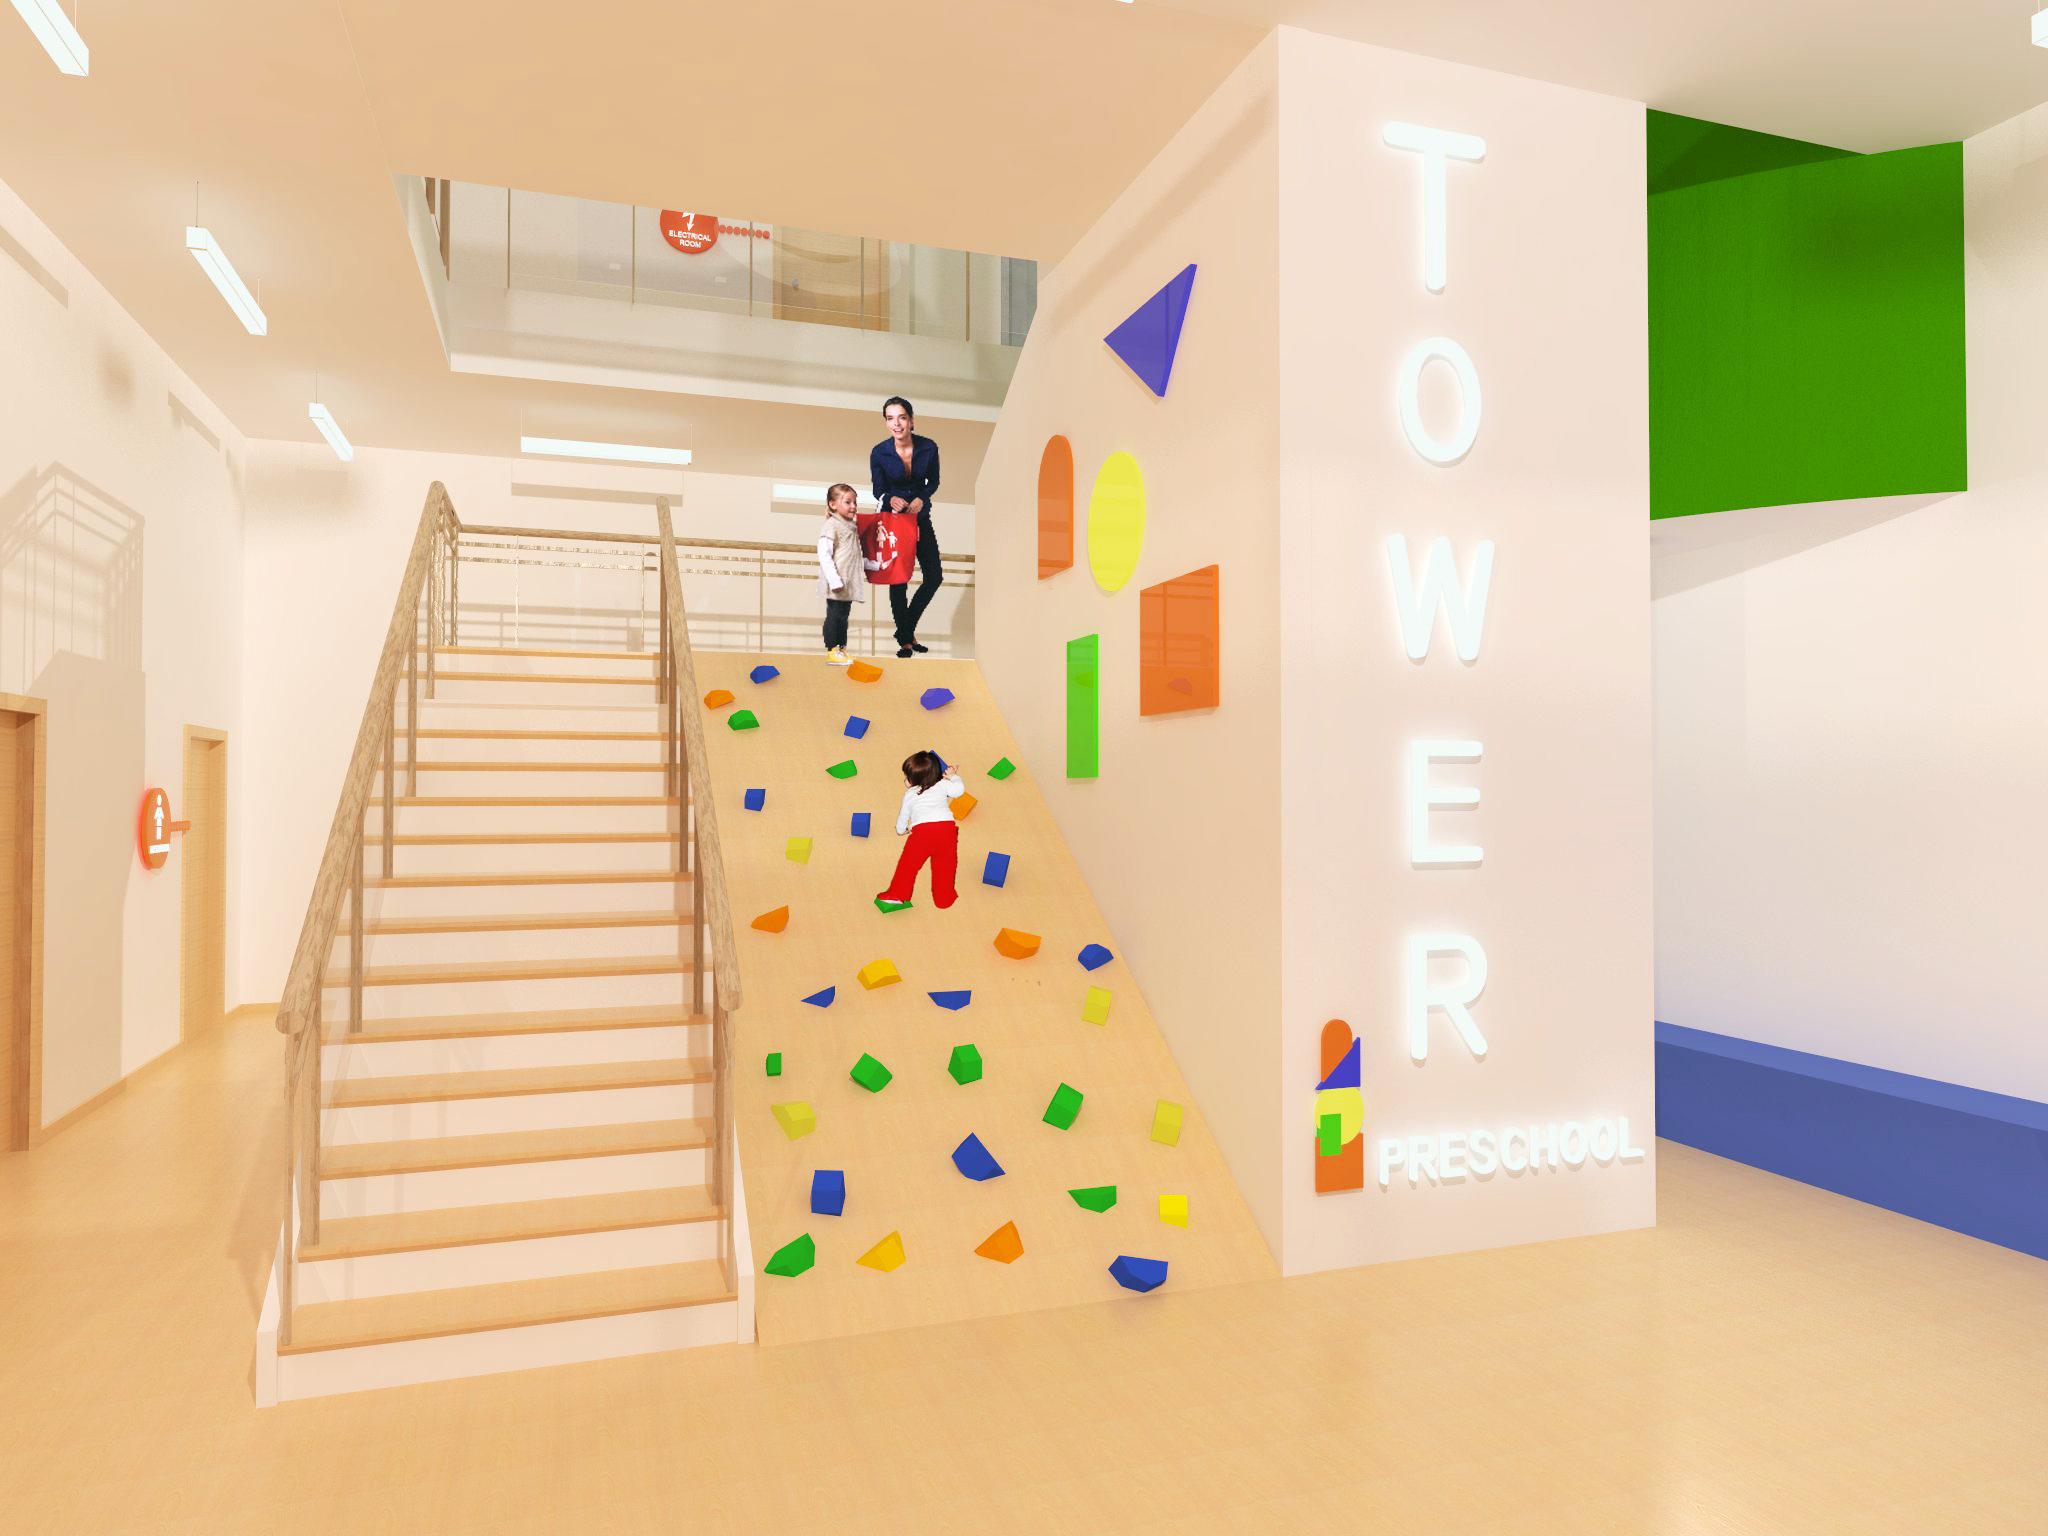 irina-kaminsky-tower-preschool-mfa-1_16951469604_o.jpg